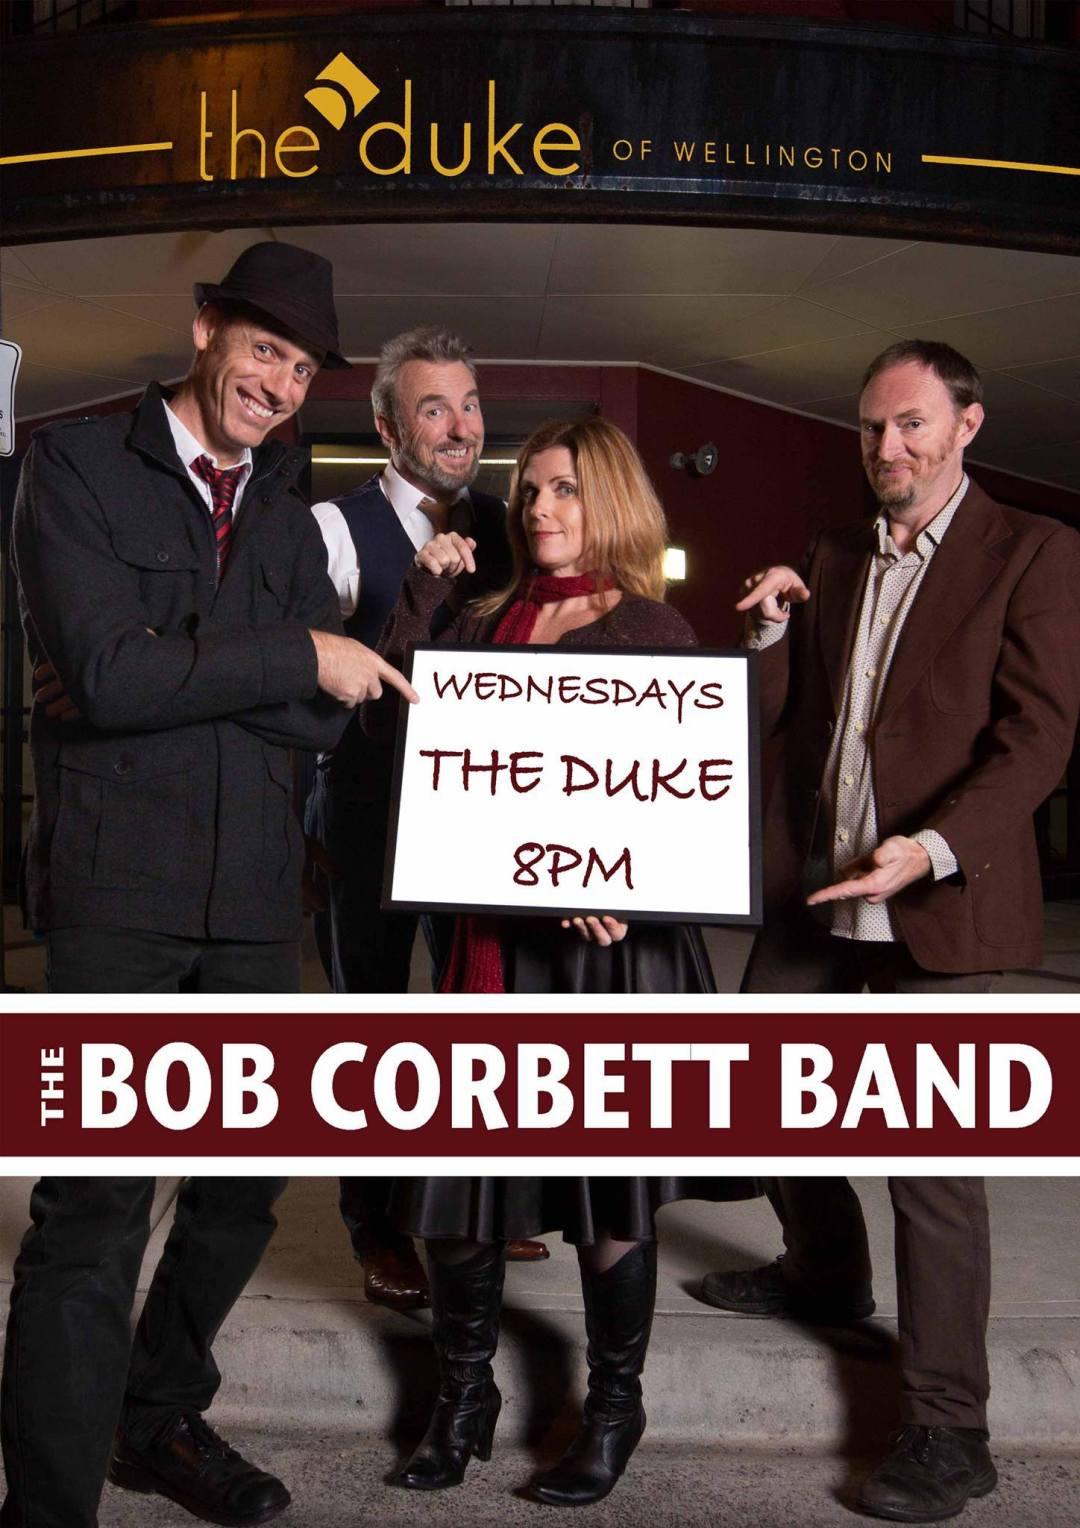 Peter Bower - Bob Corbett Band Duke Shows